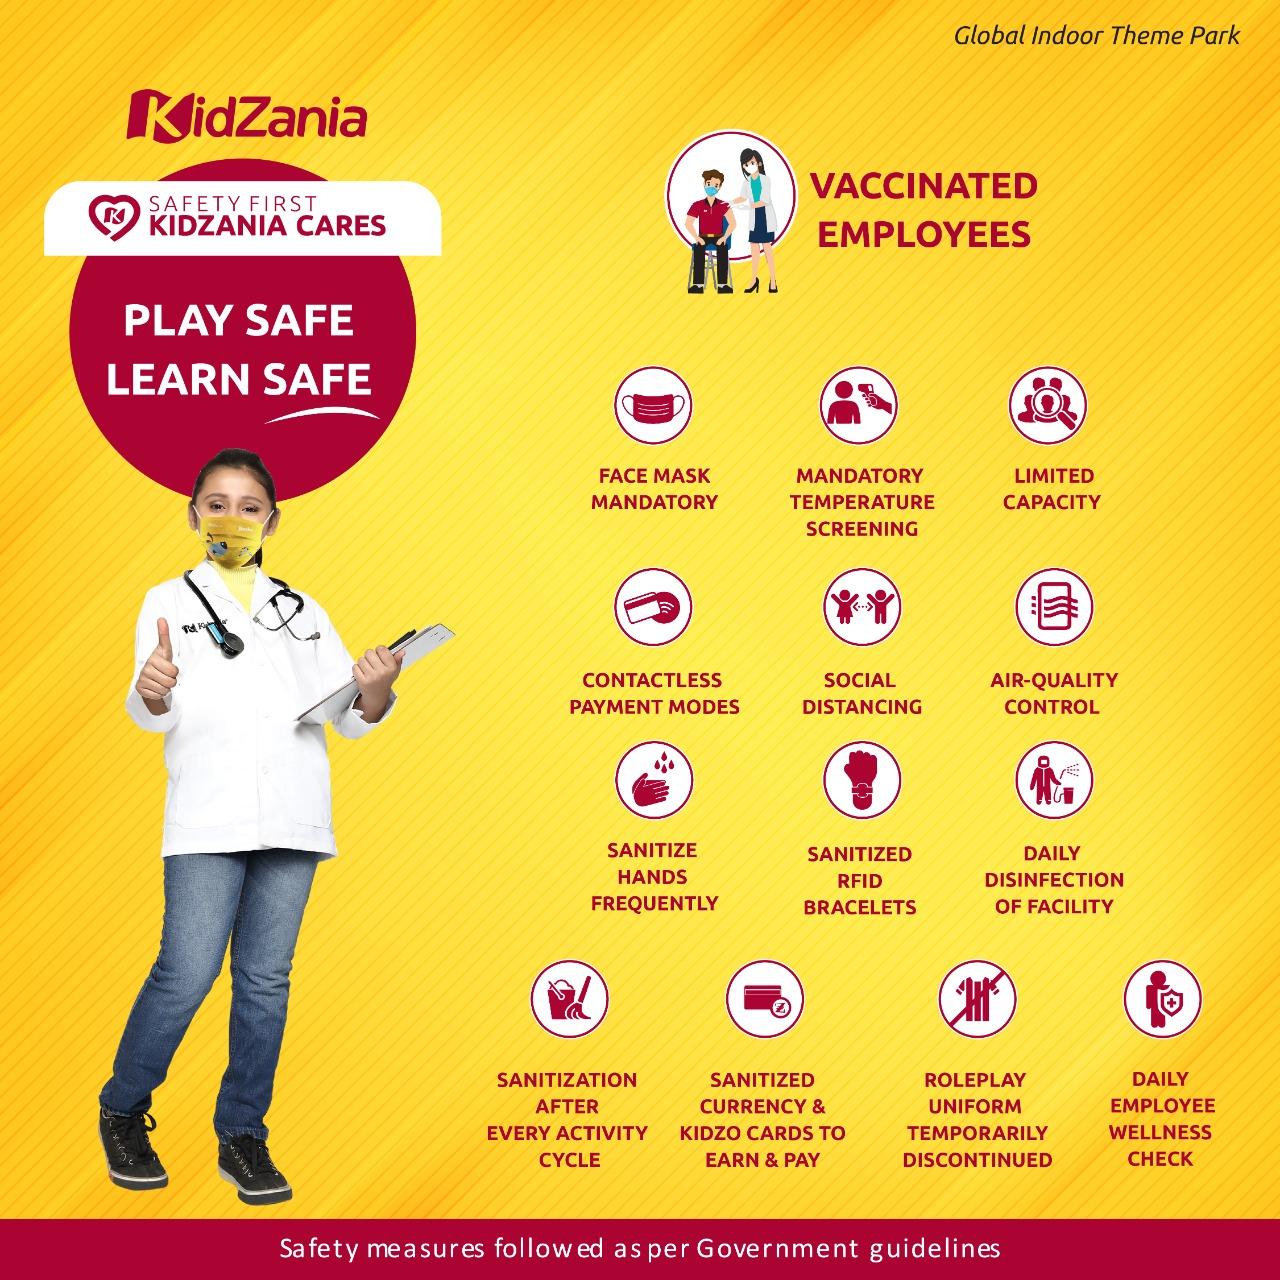 KidZania safety measures